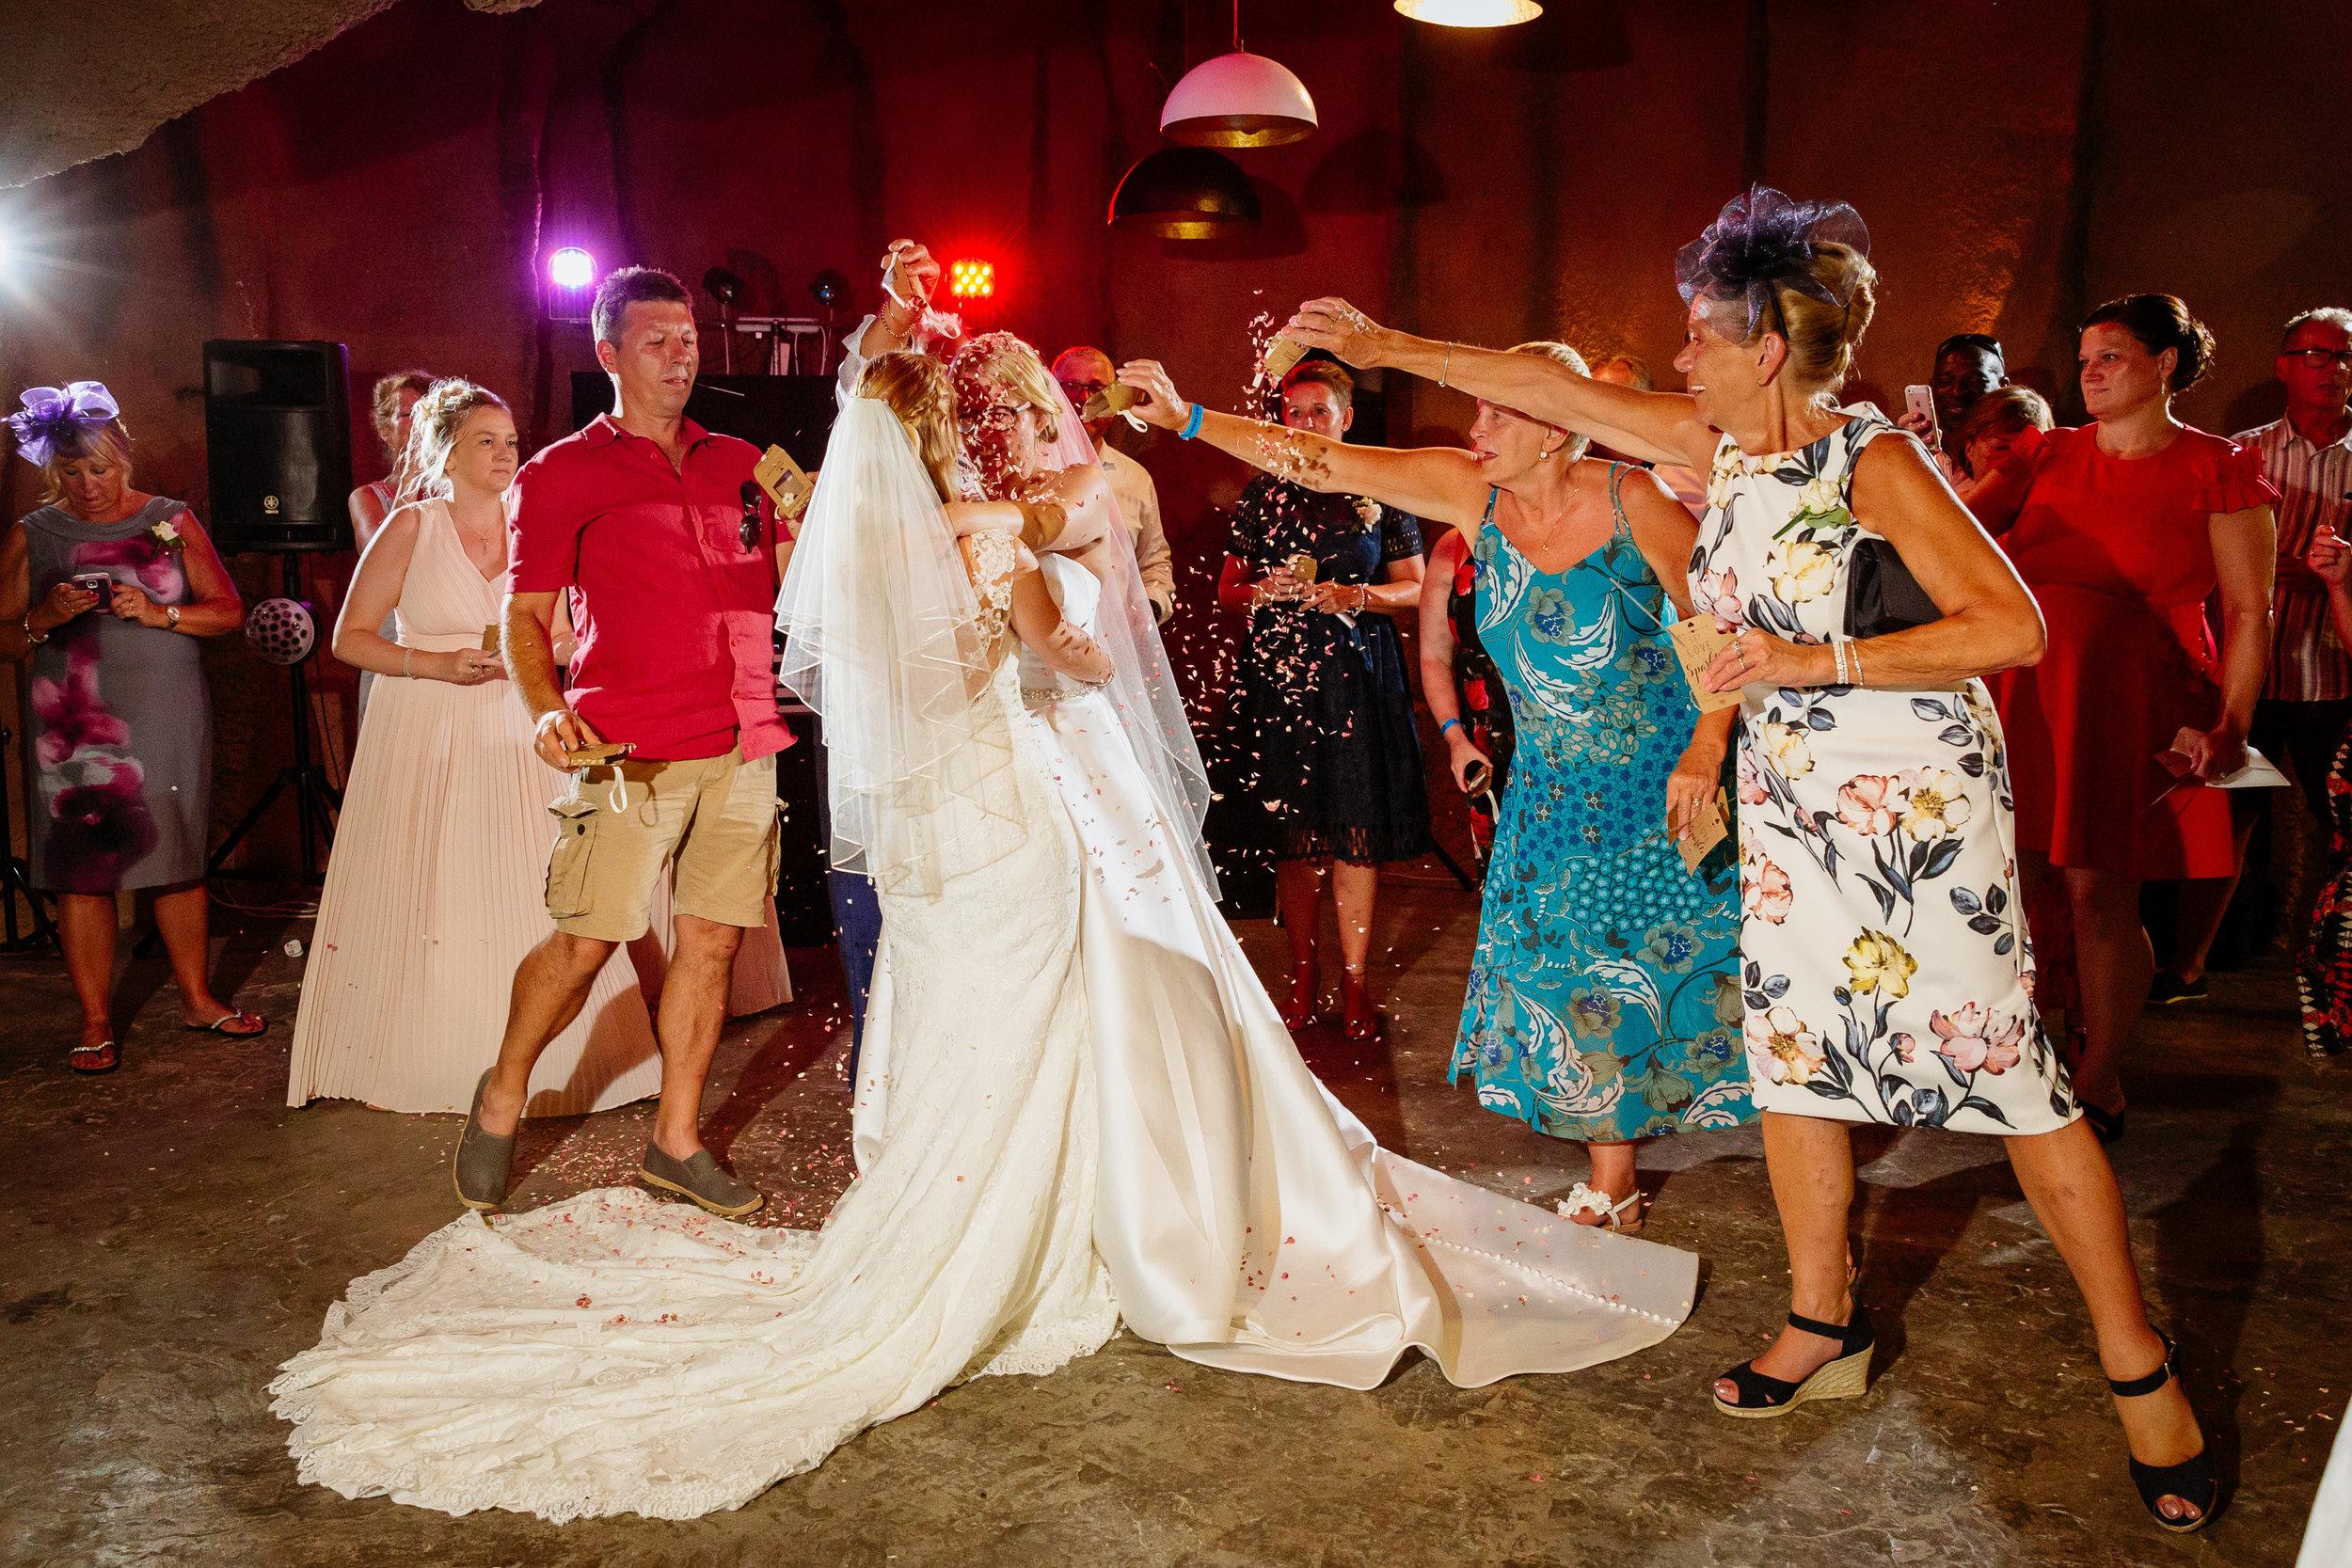 Malta_wedding_photography-104.jpg